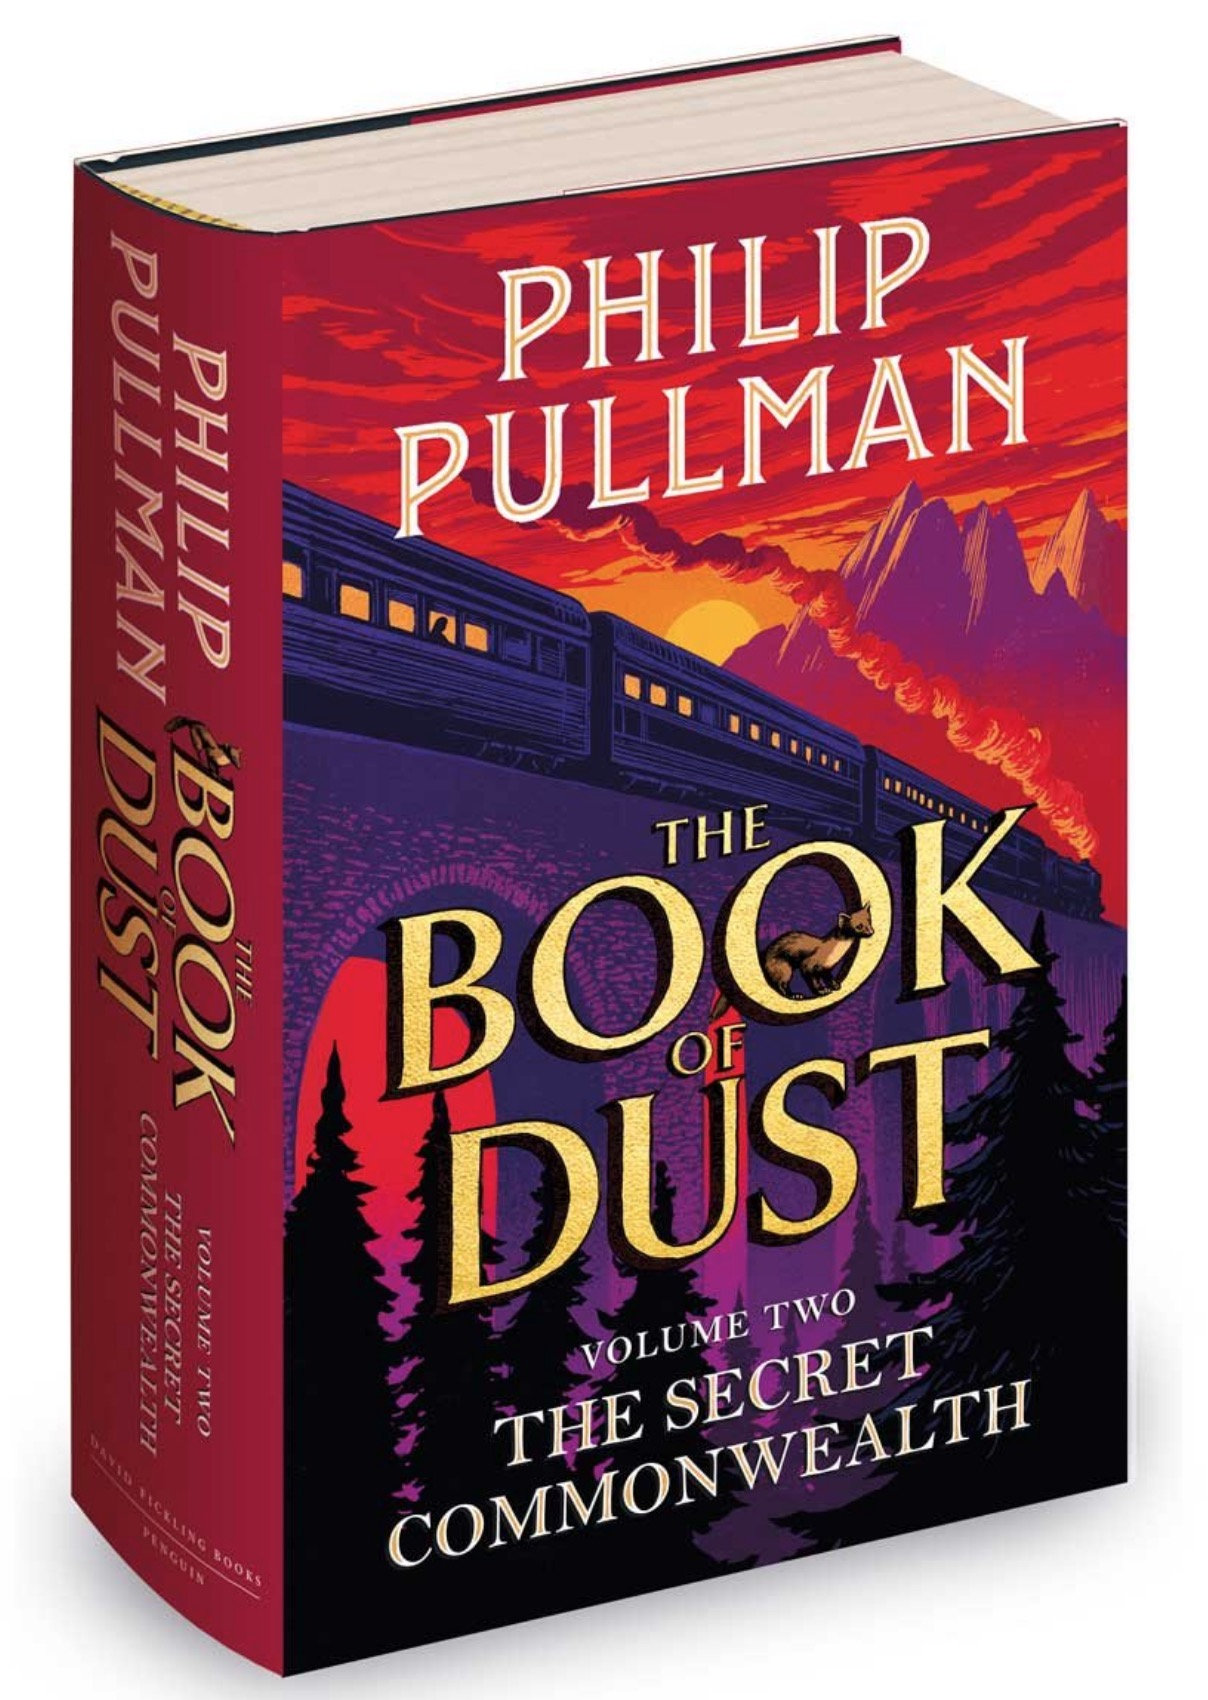 Philip Pullman Secret Commonwealth Book of Dust 2 UK cover